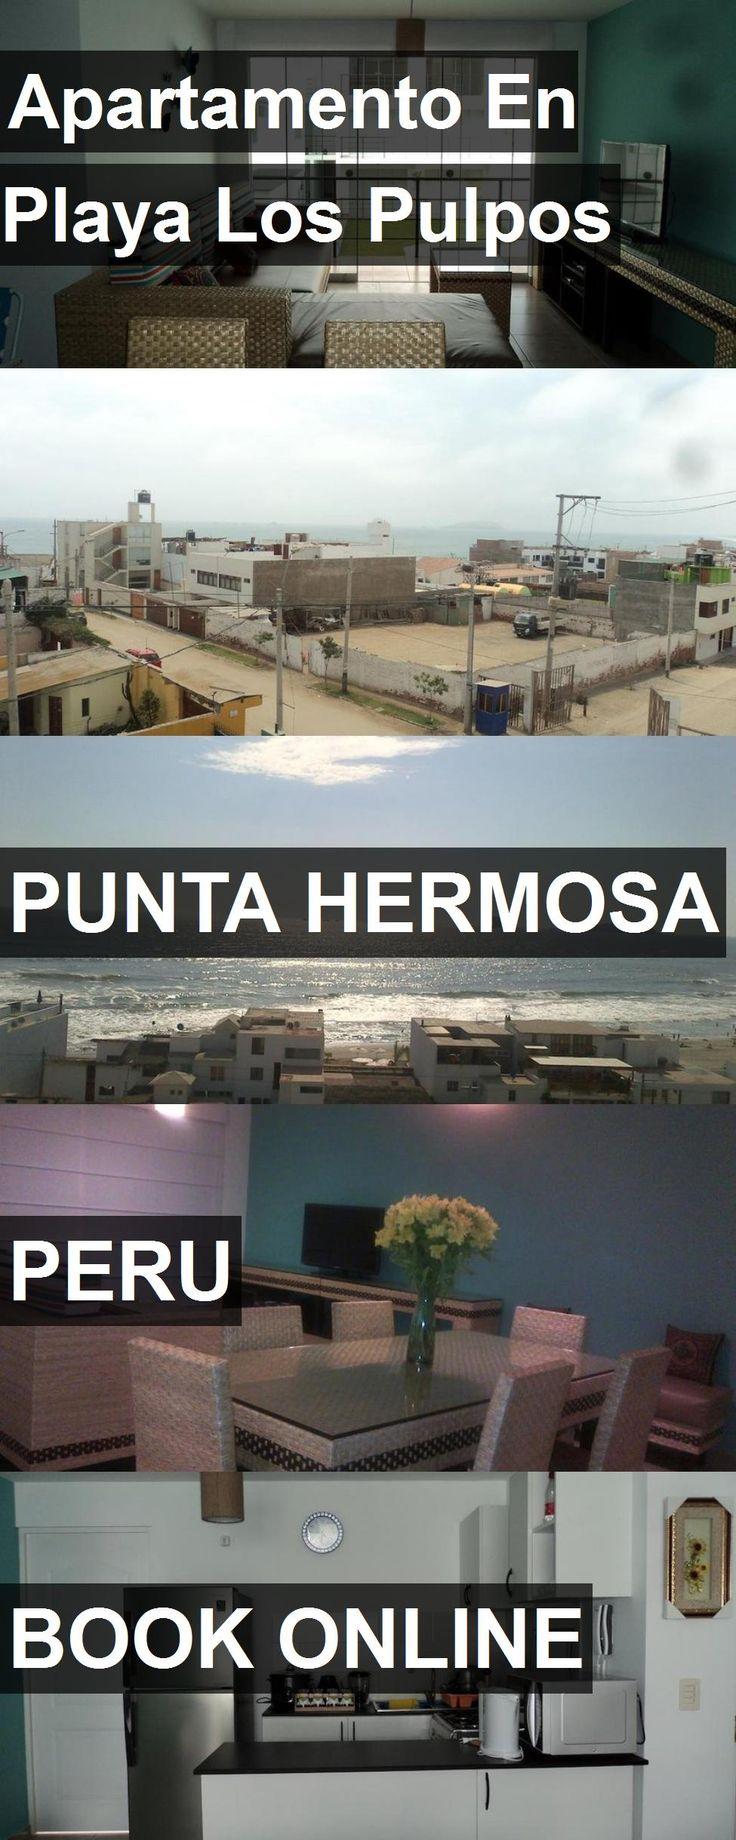 Hotel Apartamento En Playa Los Pulpos in Punta Hermosa, Peru. For more information, photos, reviews and best prices please follow the link. #Peru #PuntaHermosa #travel #vacation #hotel